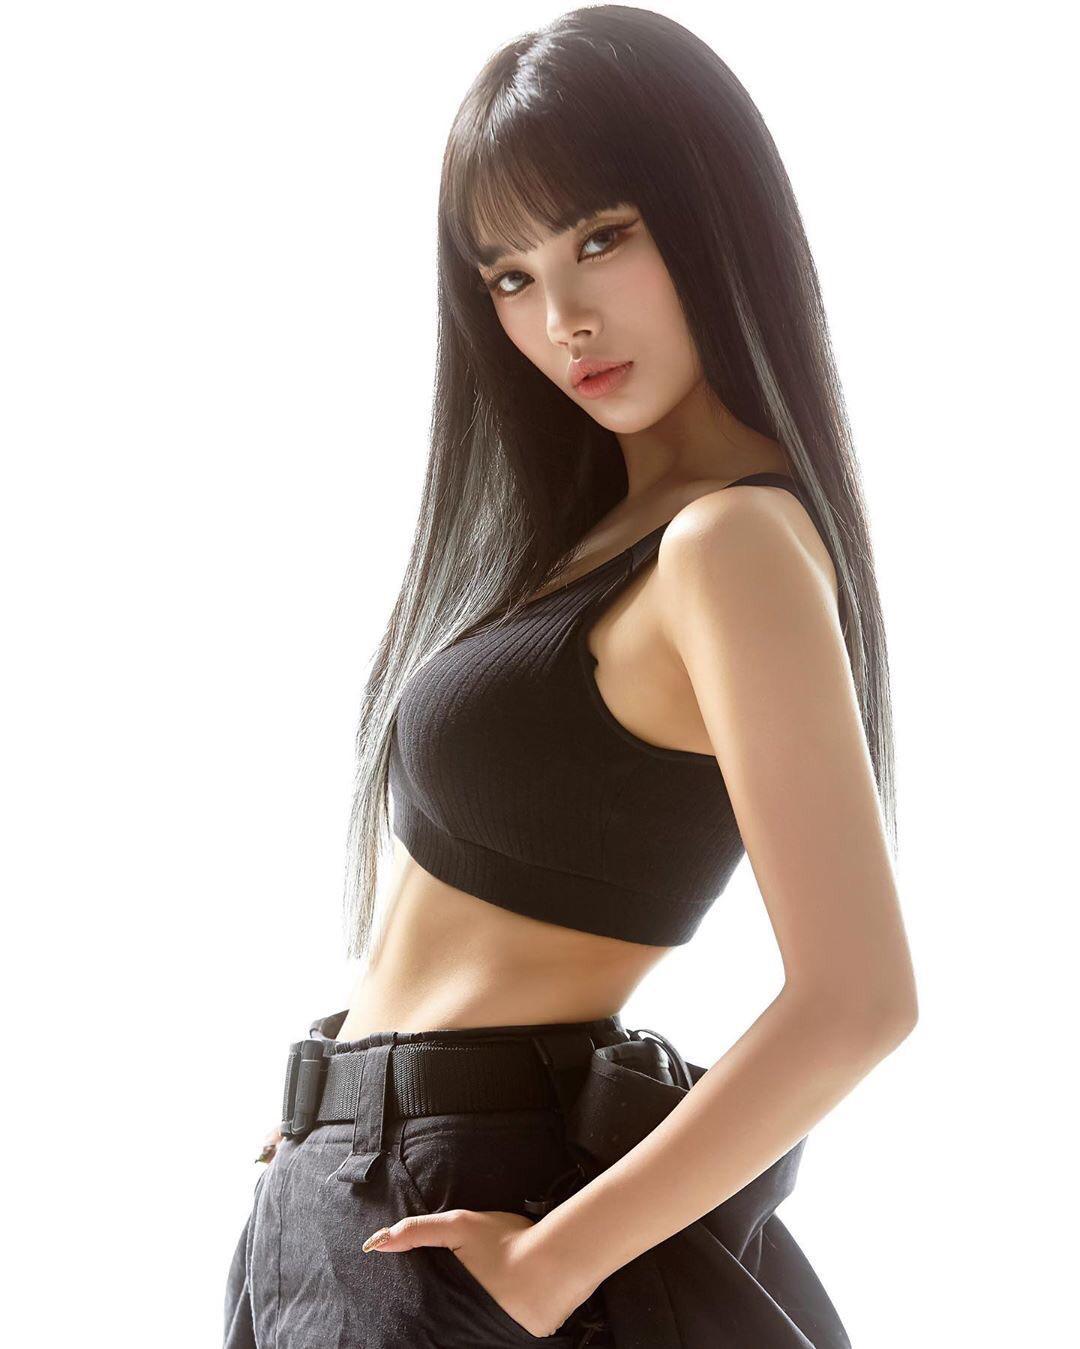 Kpop February 4